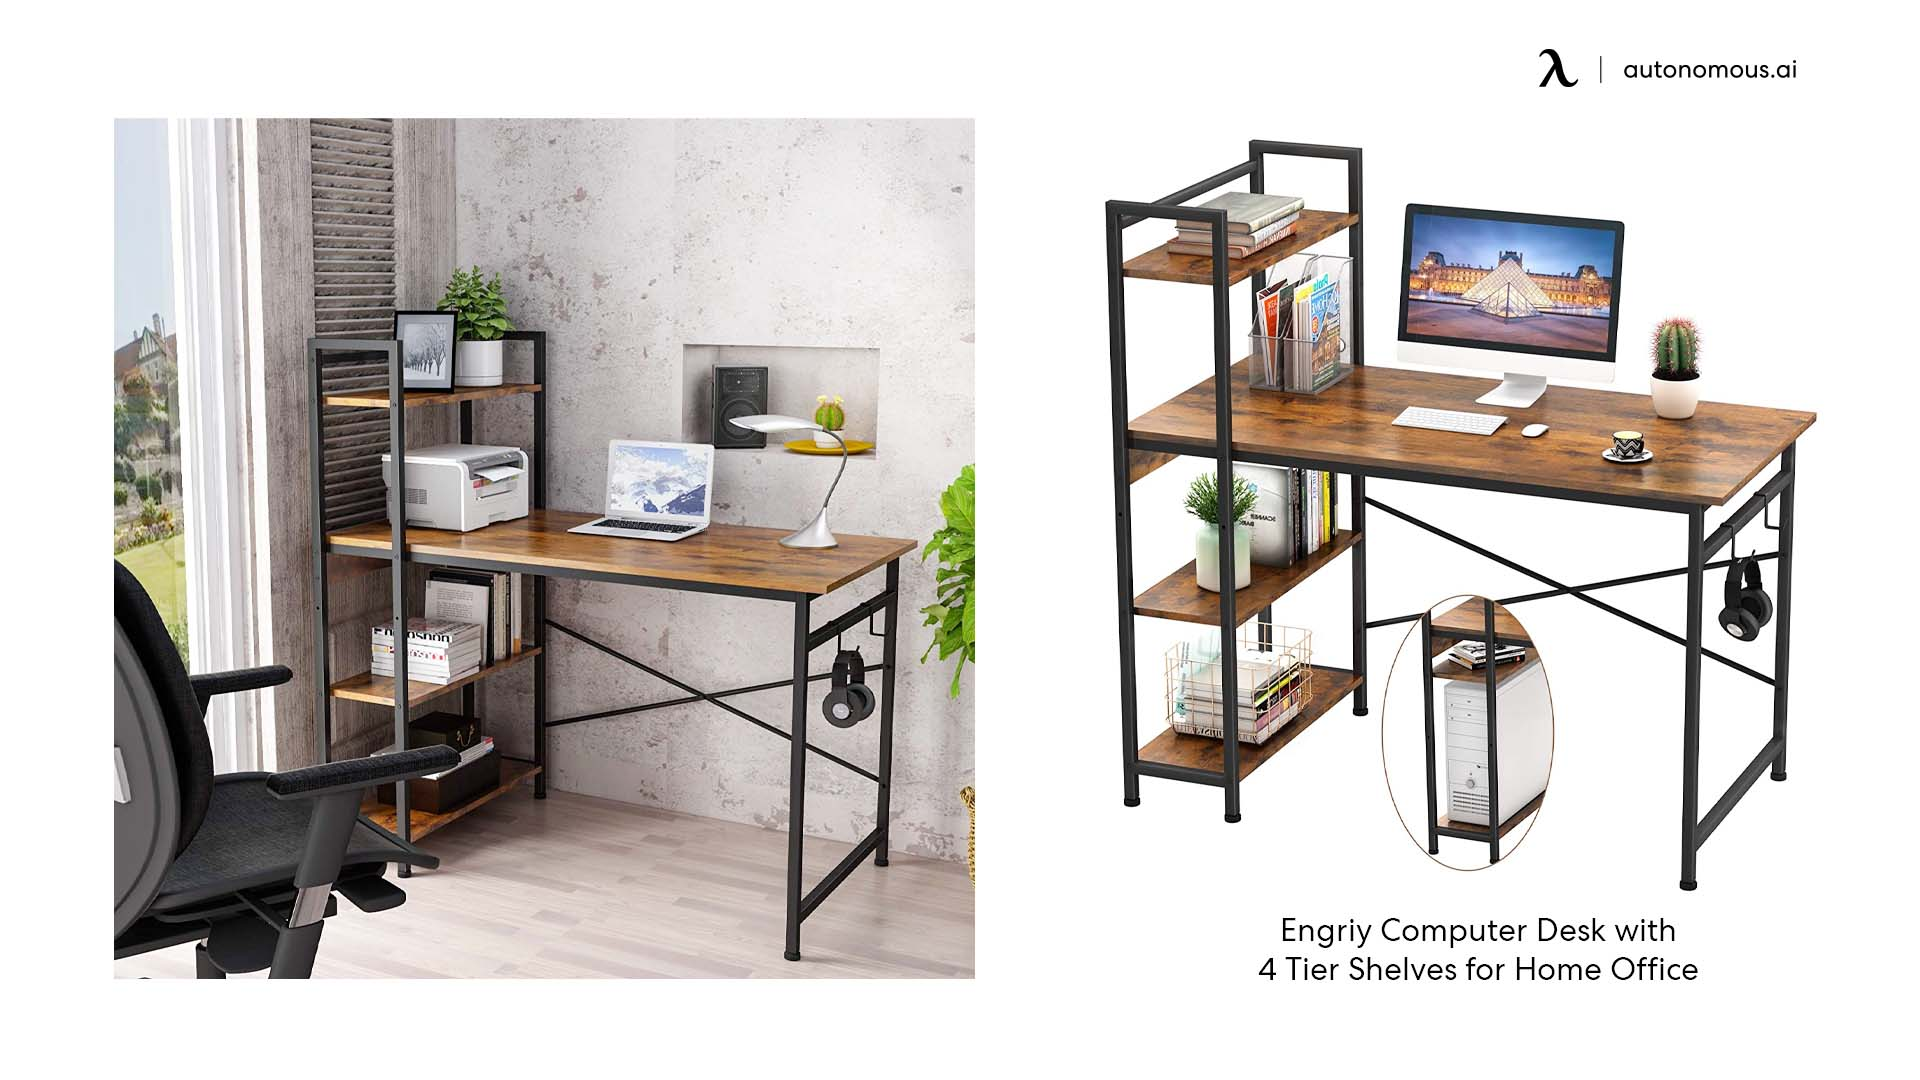 Computer Desk with Four Tier Shelves